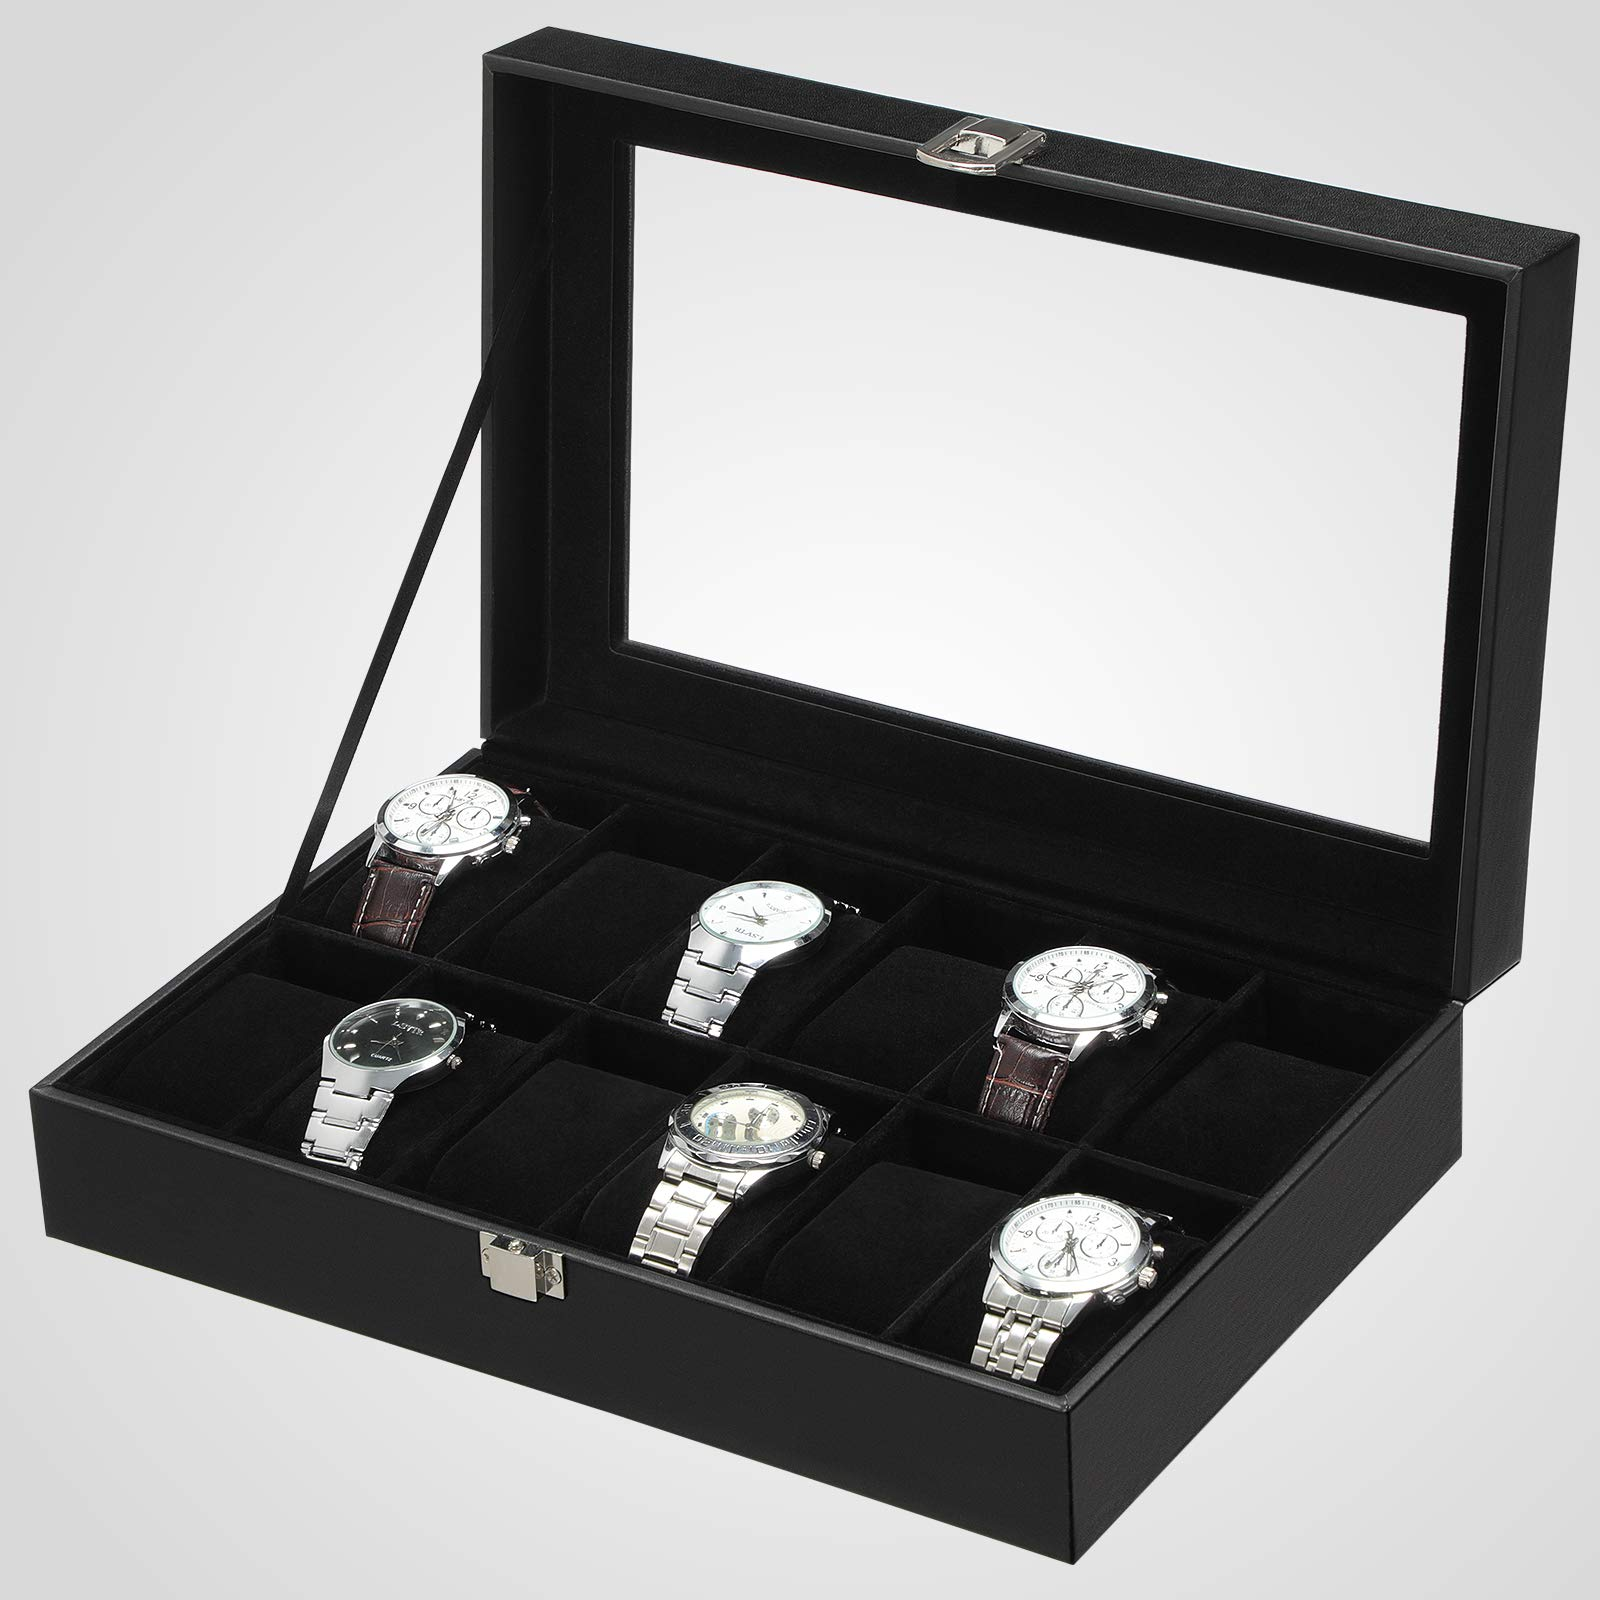 SONGMICS JWB12B-Caja (12 Compartimentos, Tapa de Cristal, Estuche para Relojes extraíble, Piel sintética), Color Negro, 32,5 x 19 x 8,5 cm: Amazon.es: Hogar